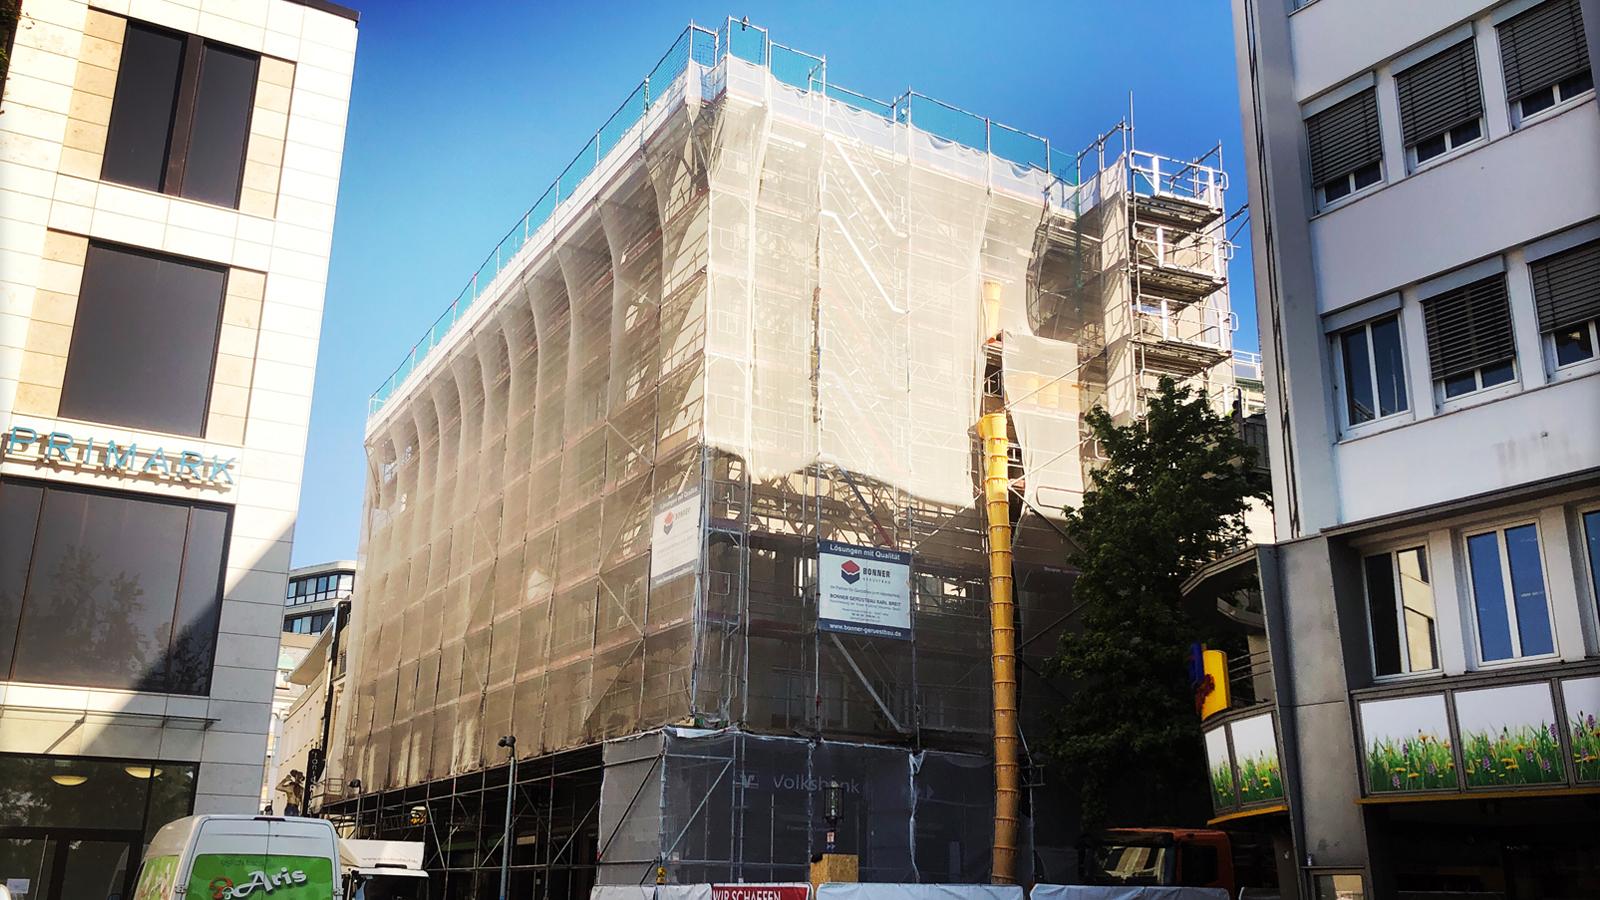 Volksbank - Architekt Bonn - Koenigs Rütter